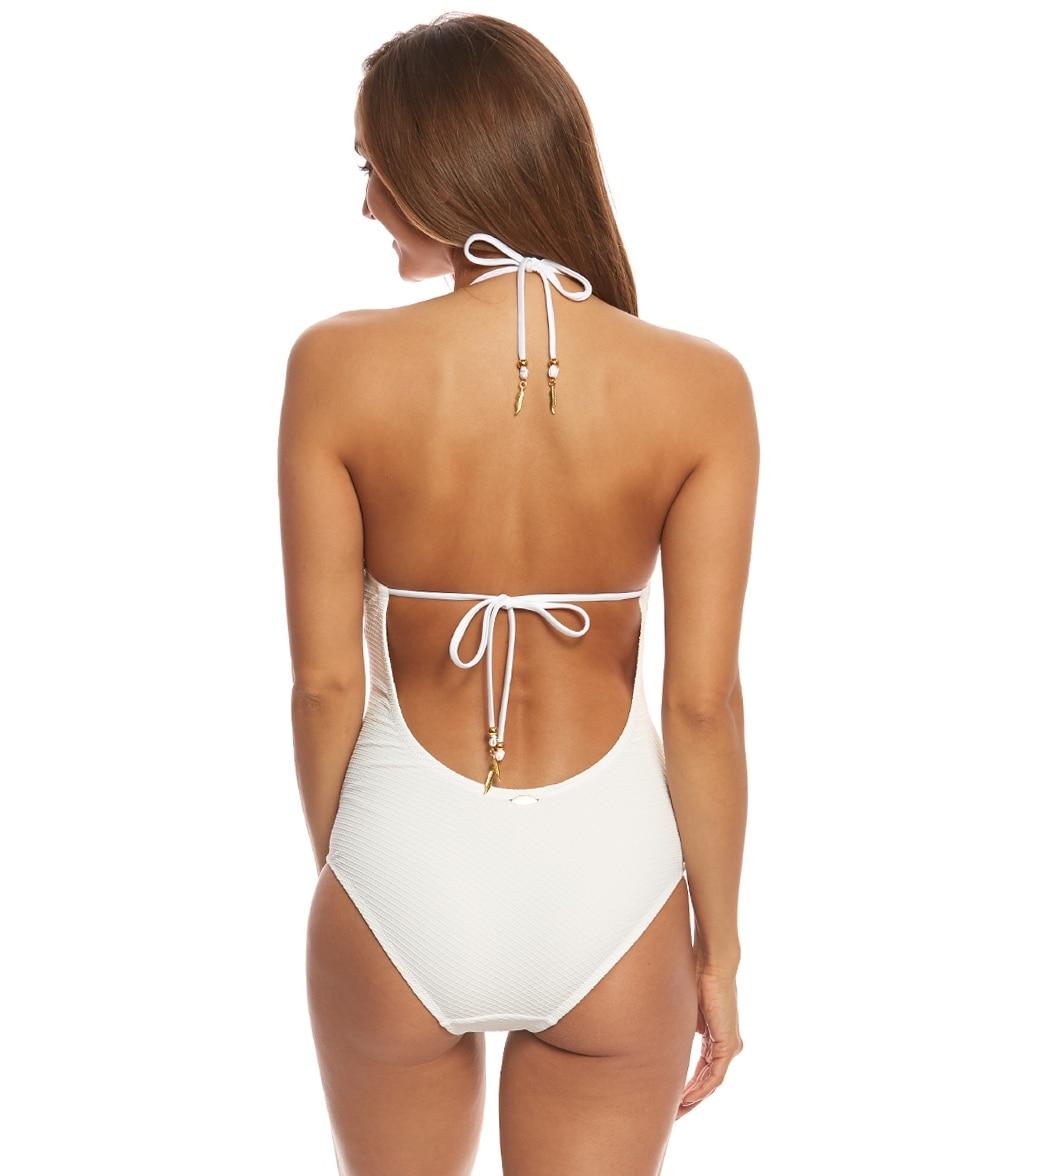 fce1342072e Jessica Simpson Swimwear Under the Sea Scalloped Edge Halter One Piece  Swimsuit